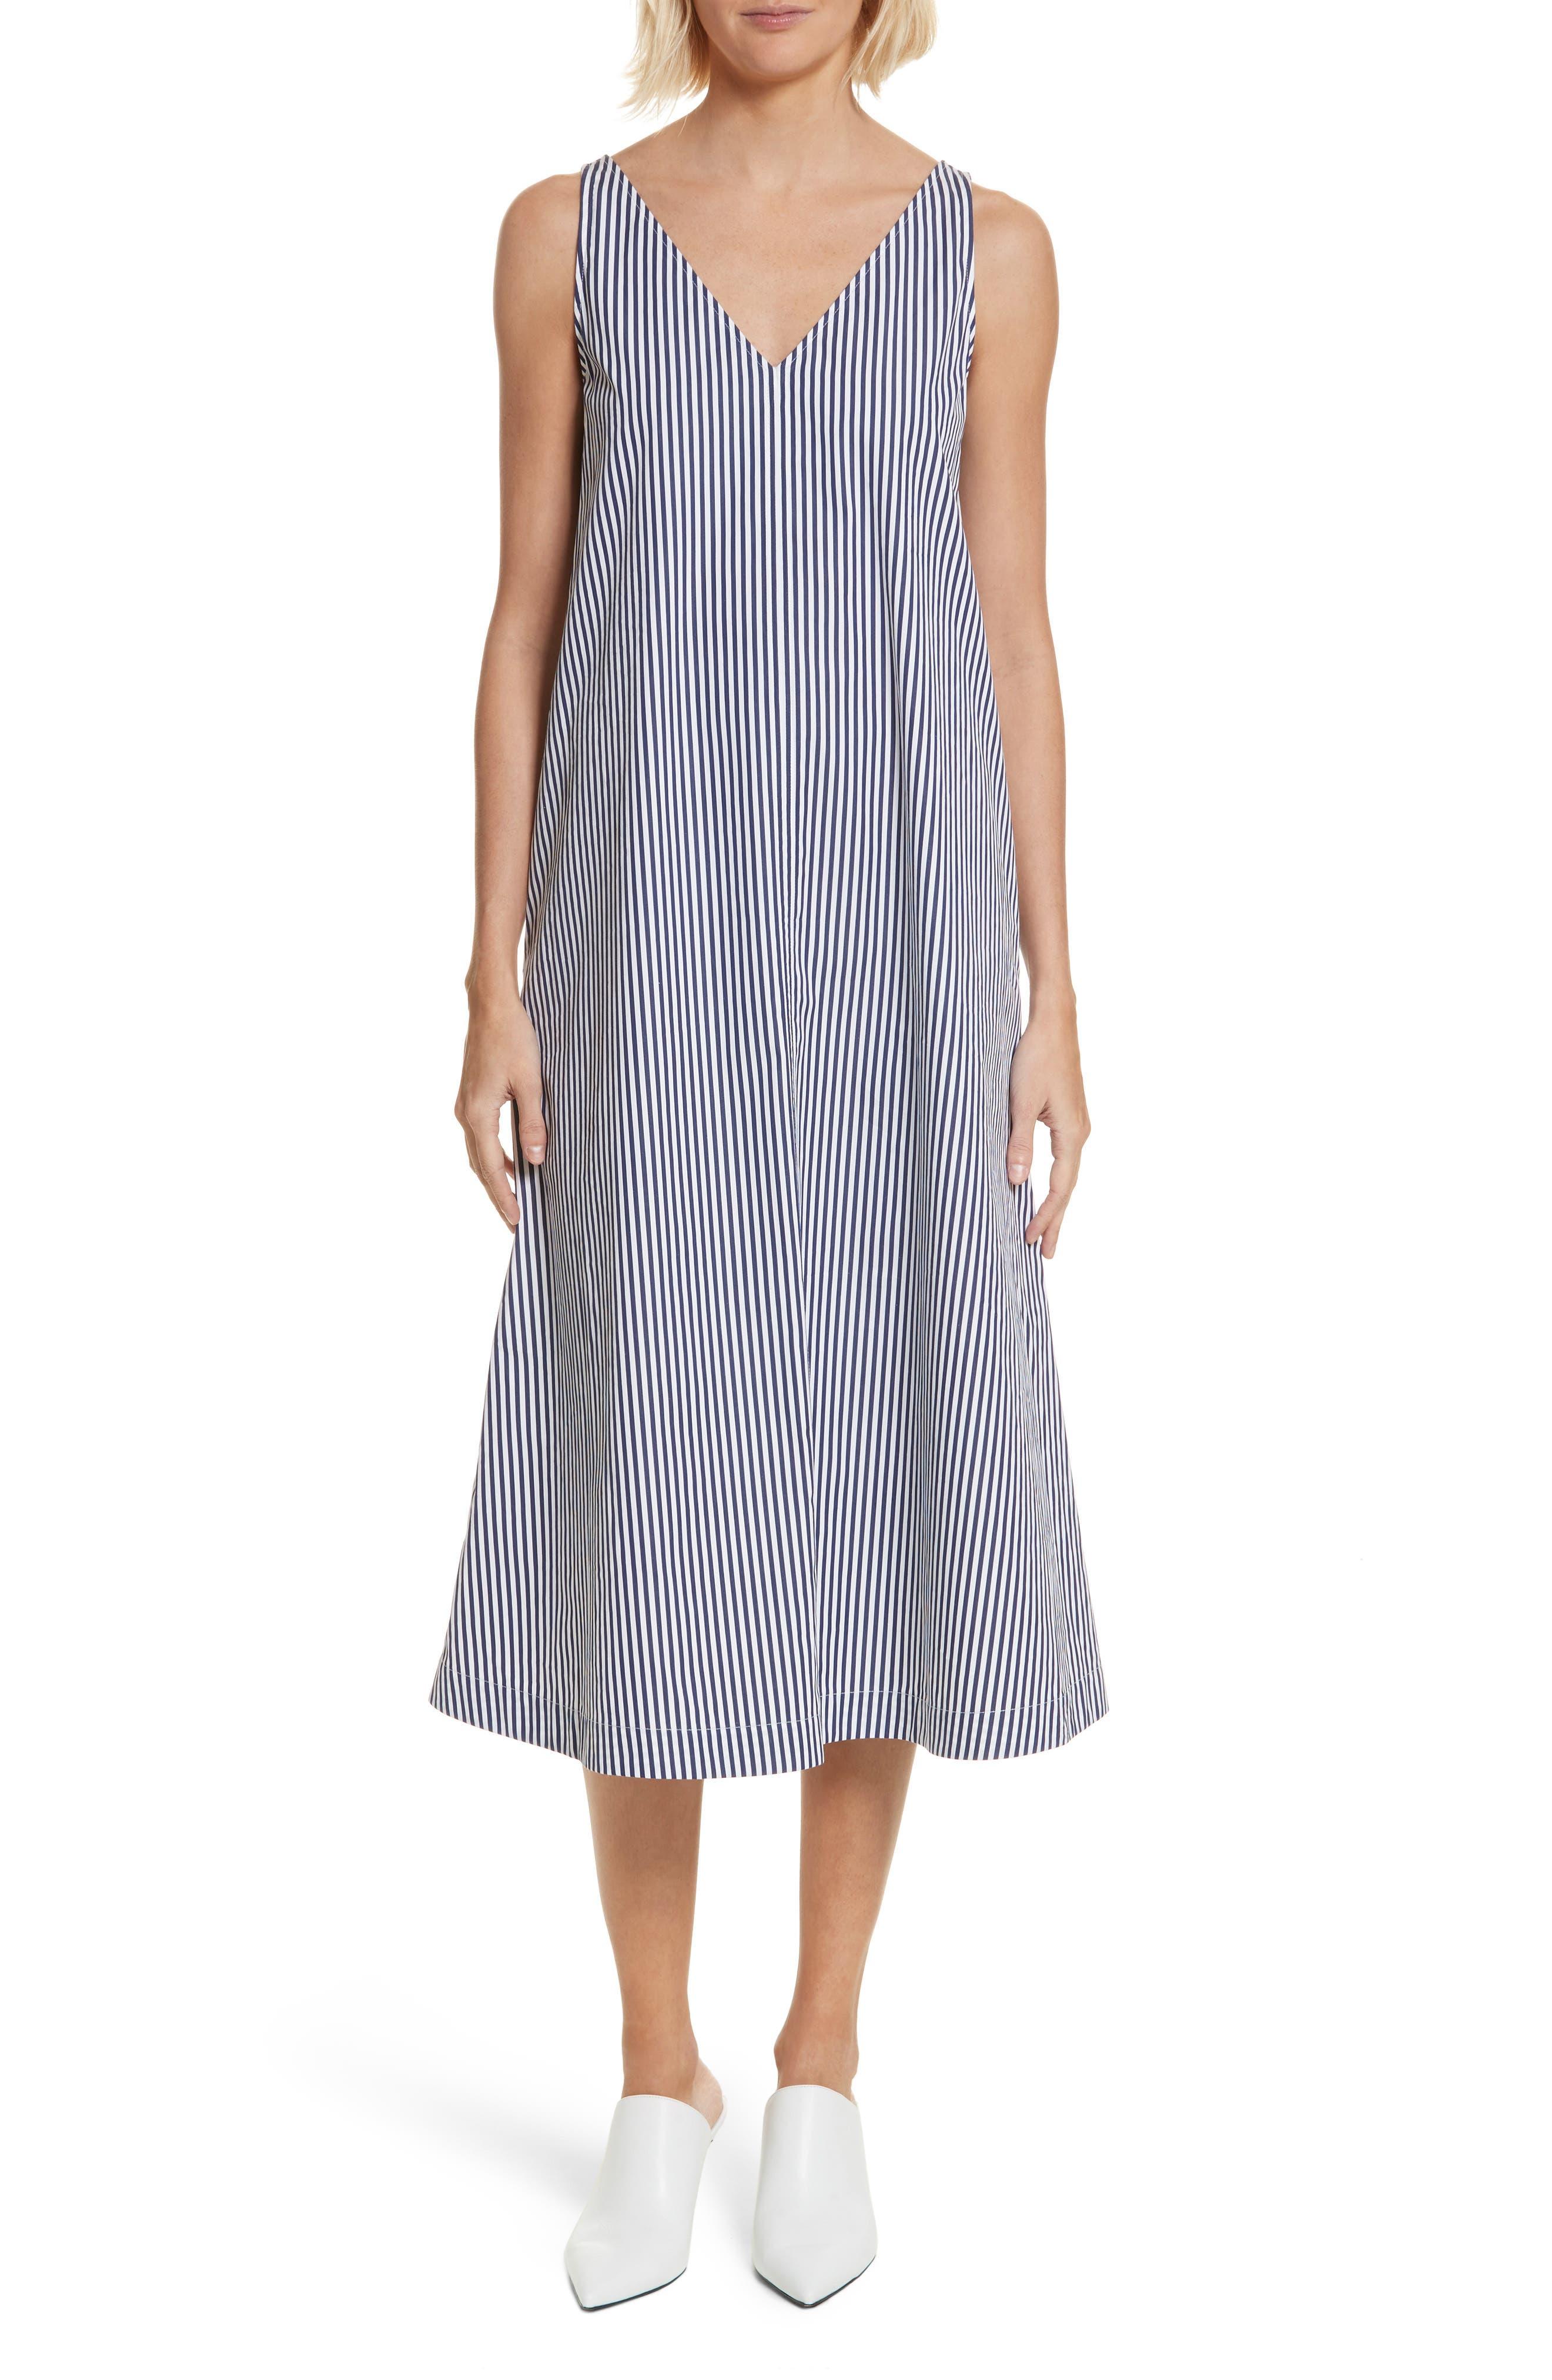 Davey Candy Stripe Shift Dress,                         Main,                         color, 456